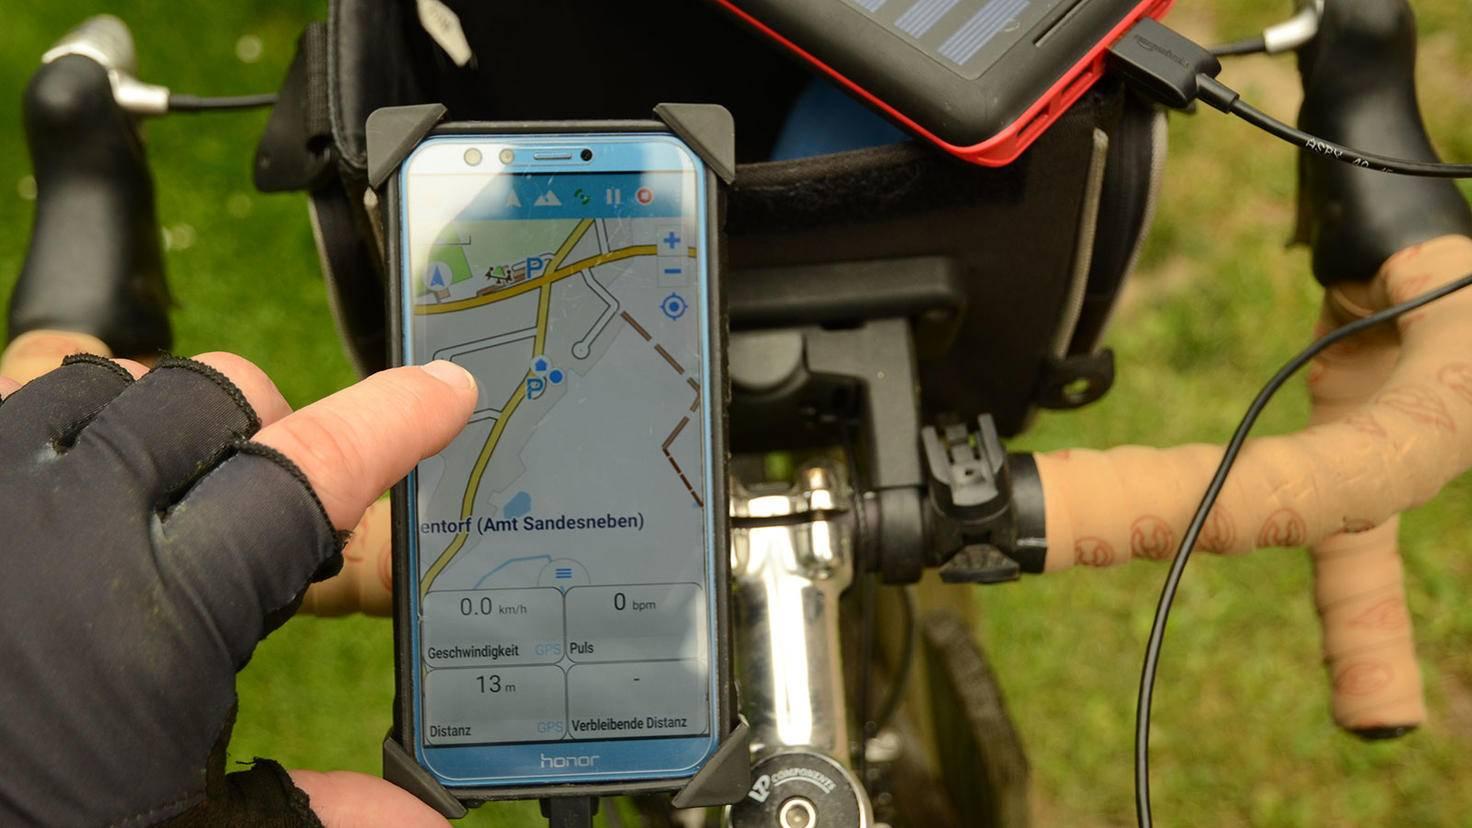 Fahrrad Navi am Lenker mit Lenkertasche